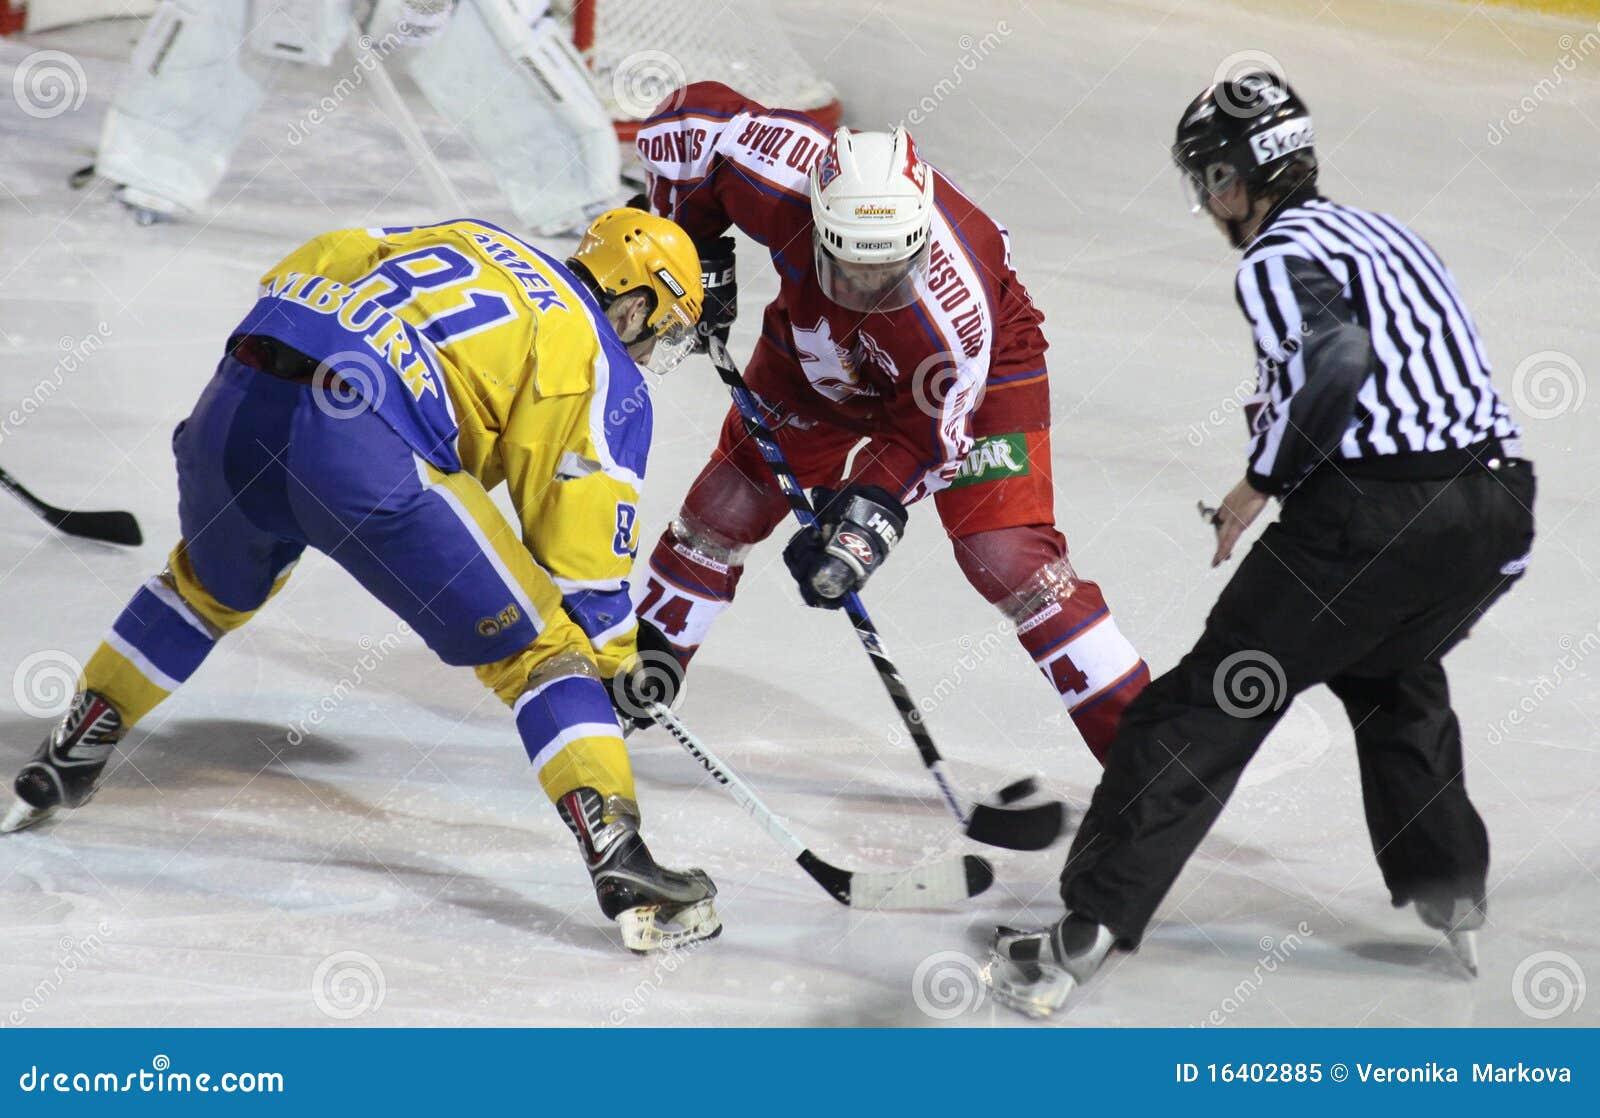 ice hockey match today